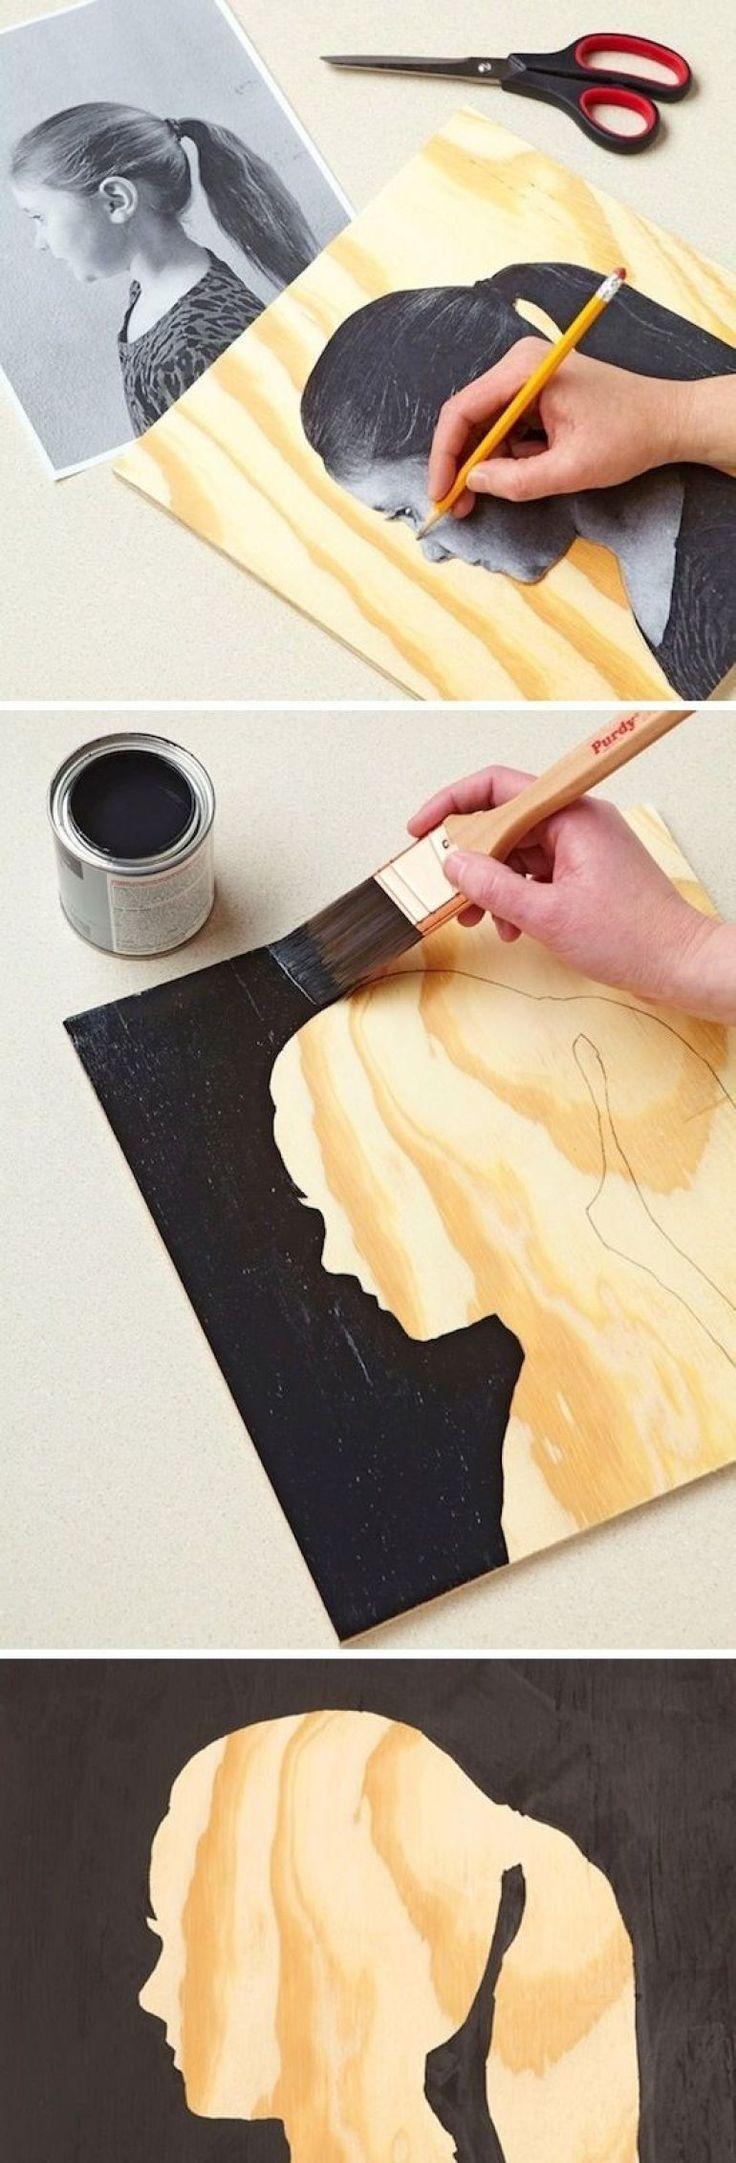 1-Creative DIY Wall Art Projects-hometshetics.net (4)